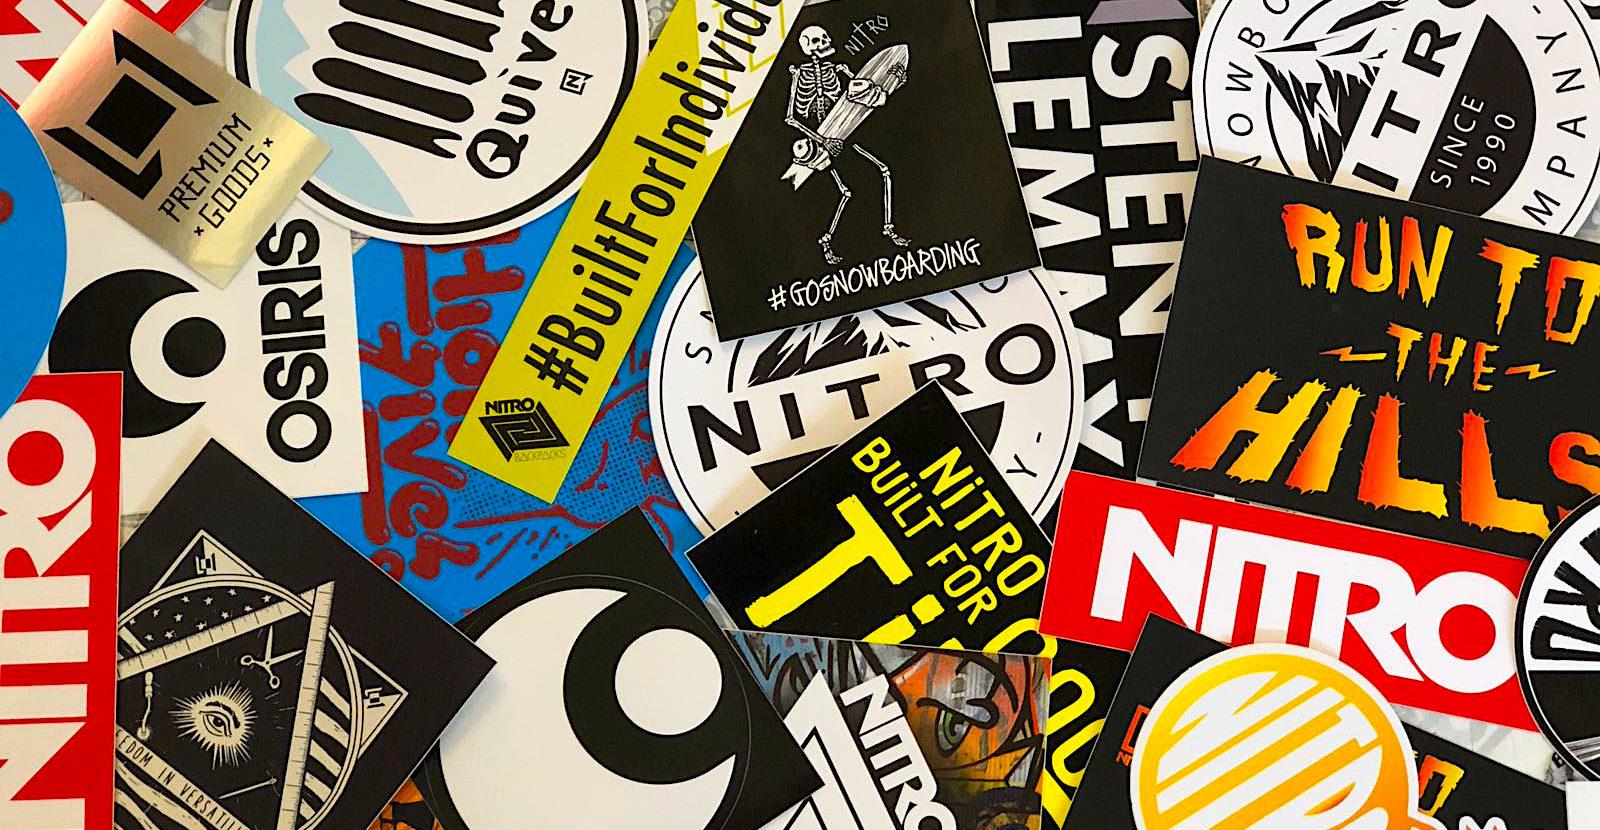 Cataloghi/stickers